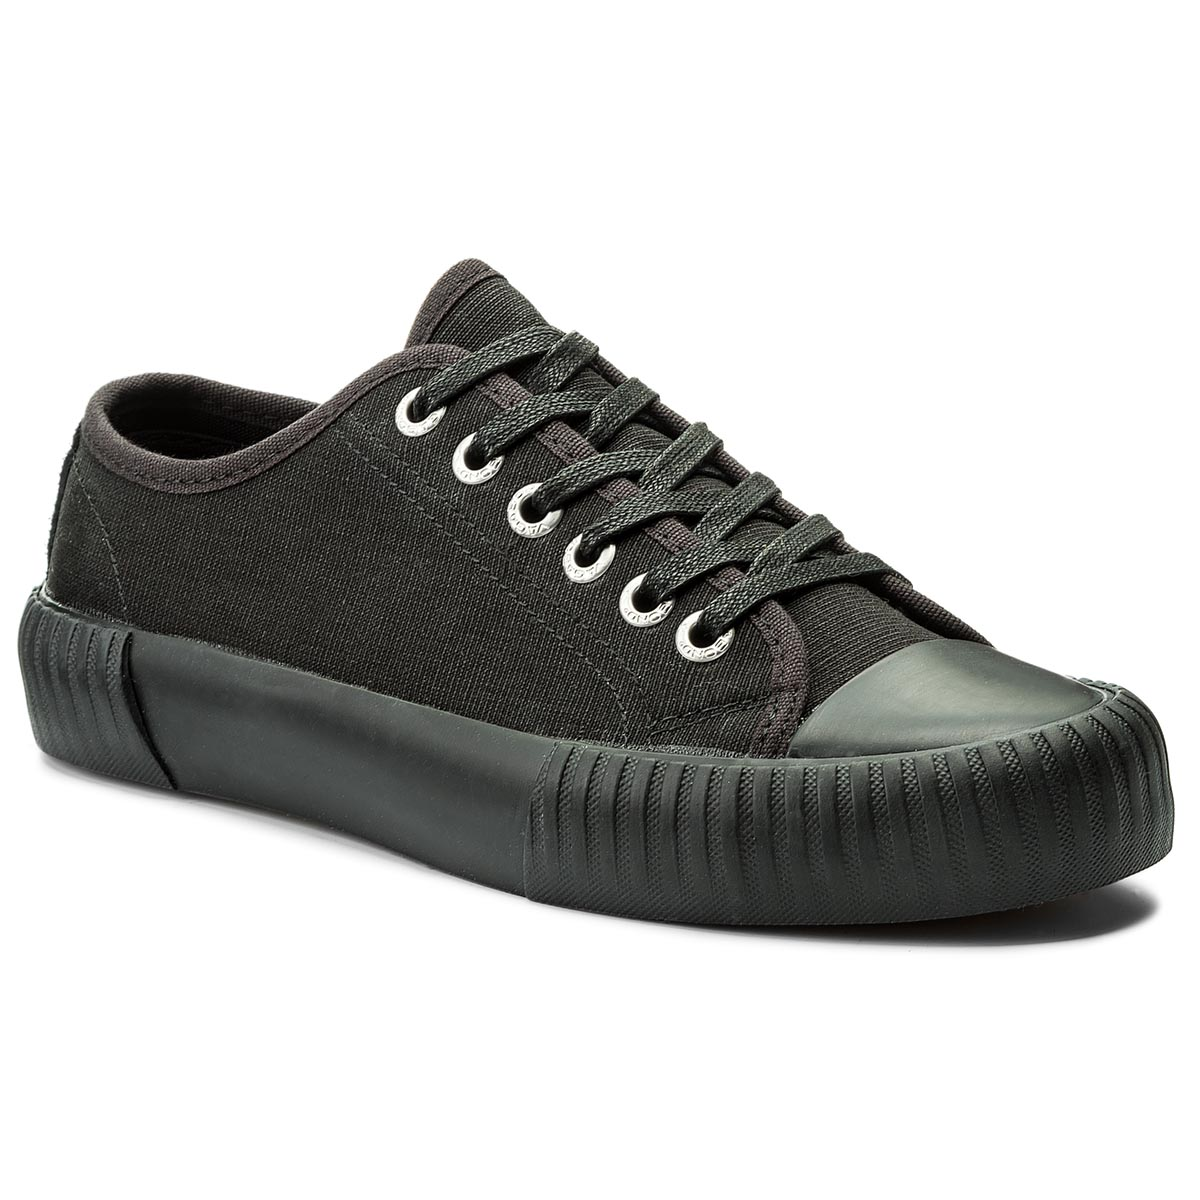 Low 65 Sneakers Vagabond 4546 W 080 Shoes Deniz Navy SMqpUzV